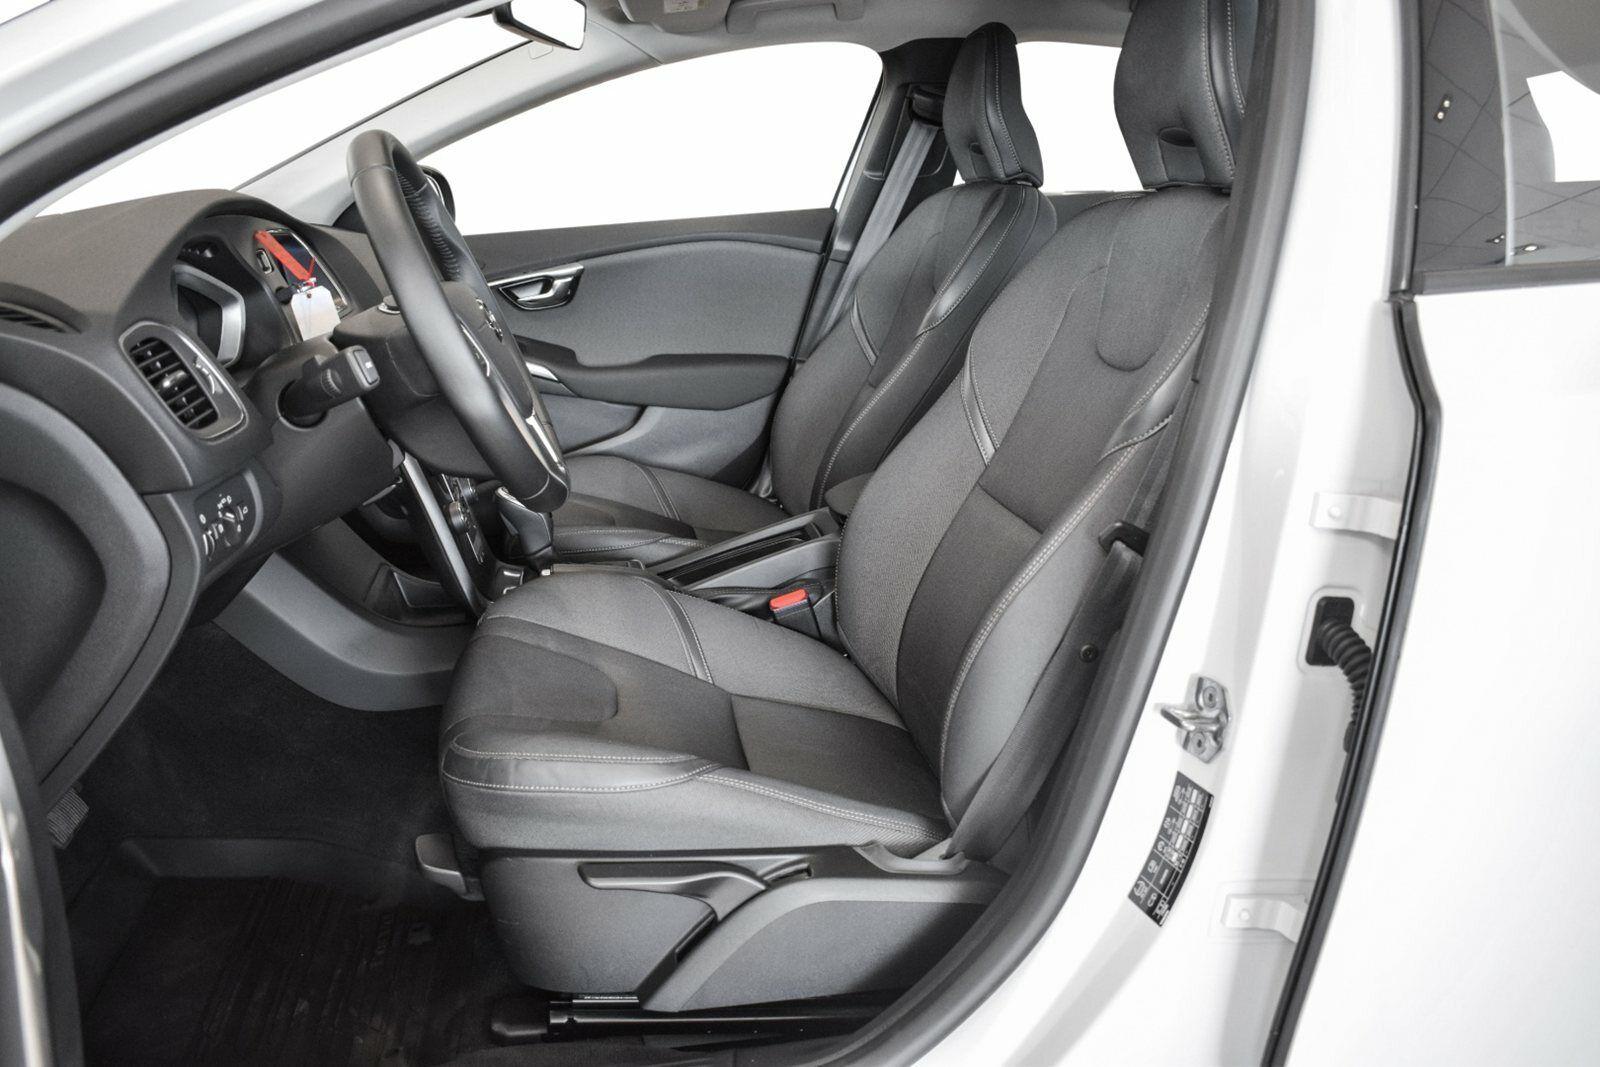 Volvo V40 CC 2,0 D3 150 Momentum aut. - billede 6